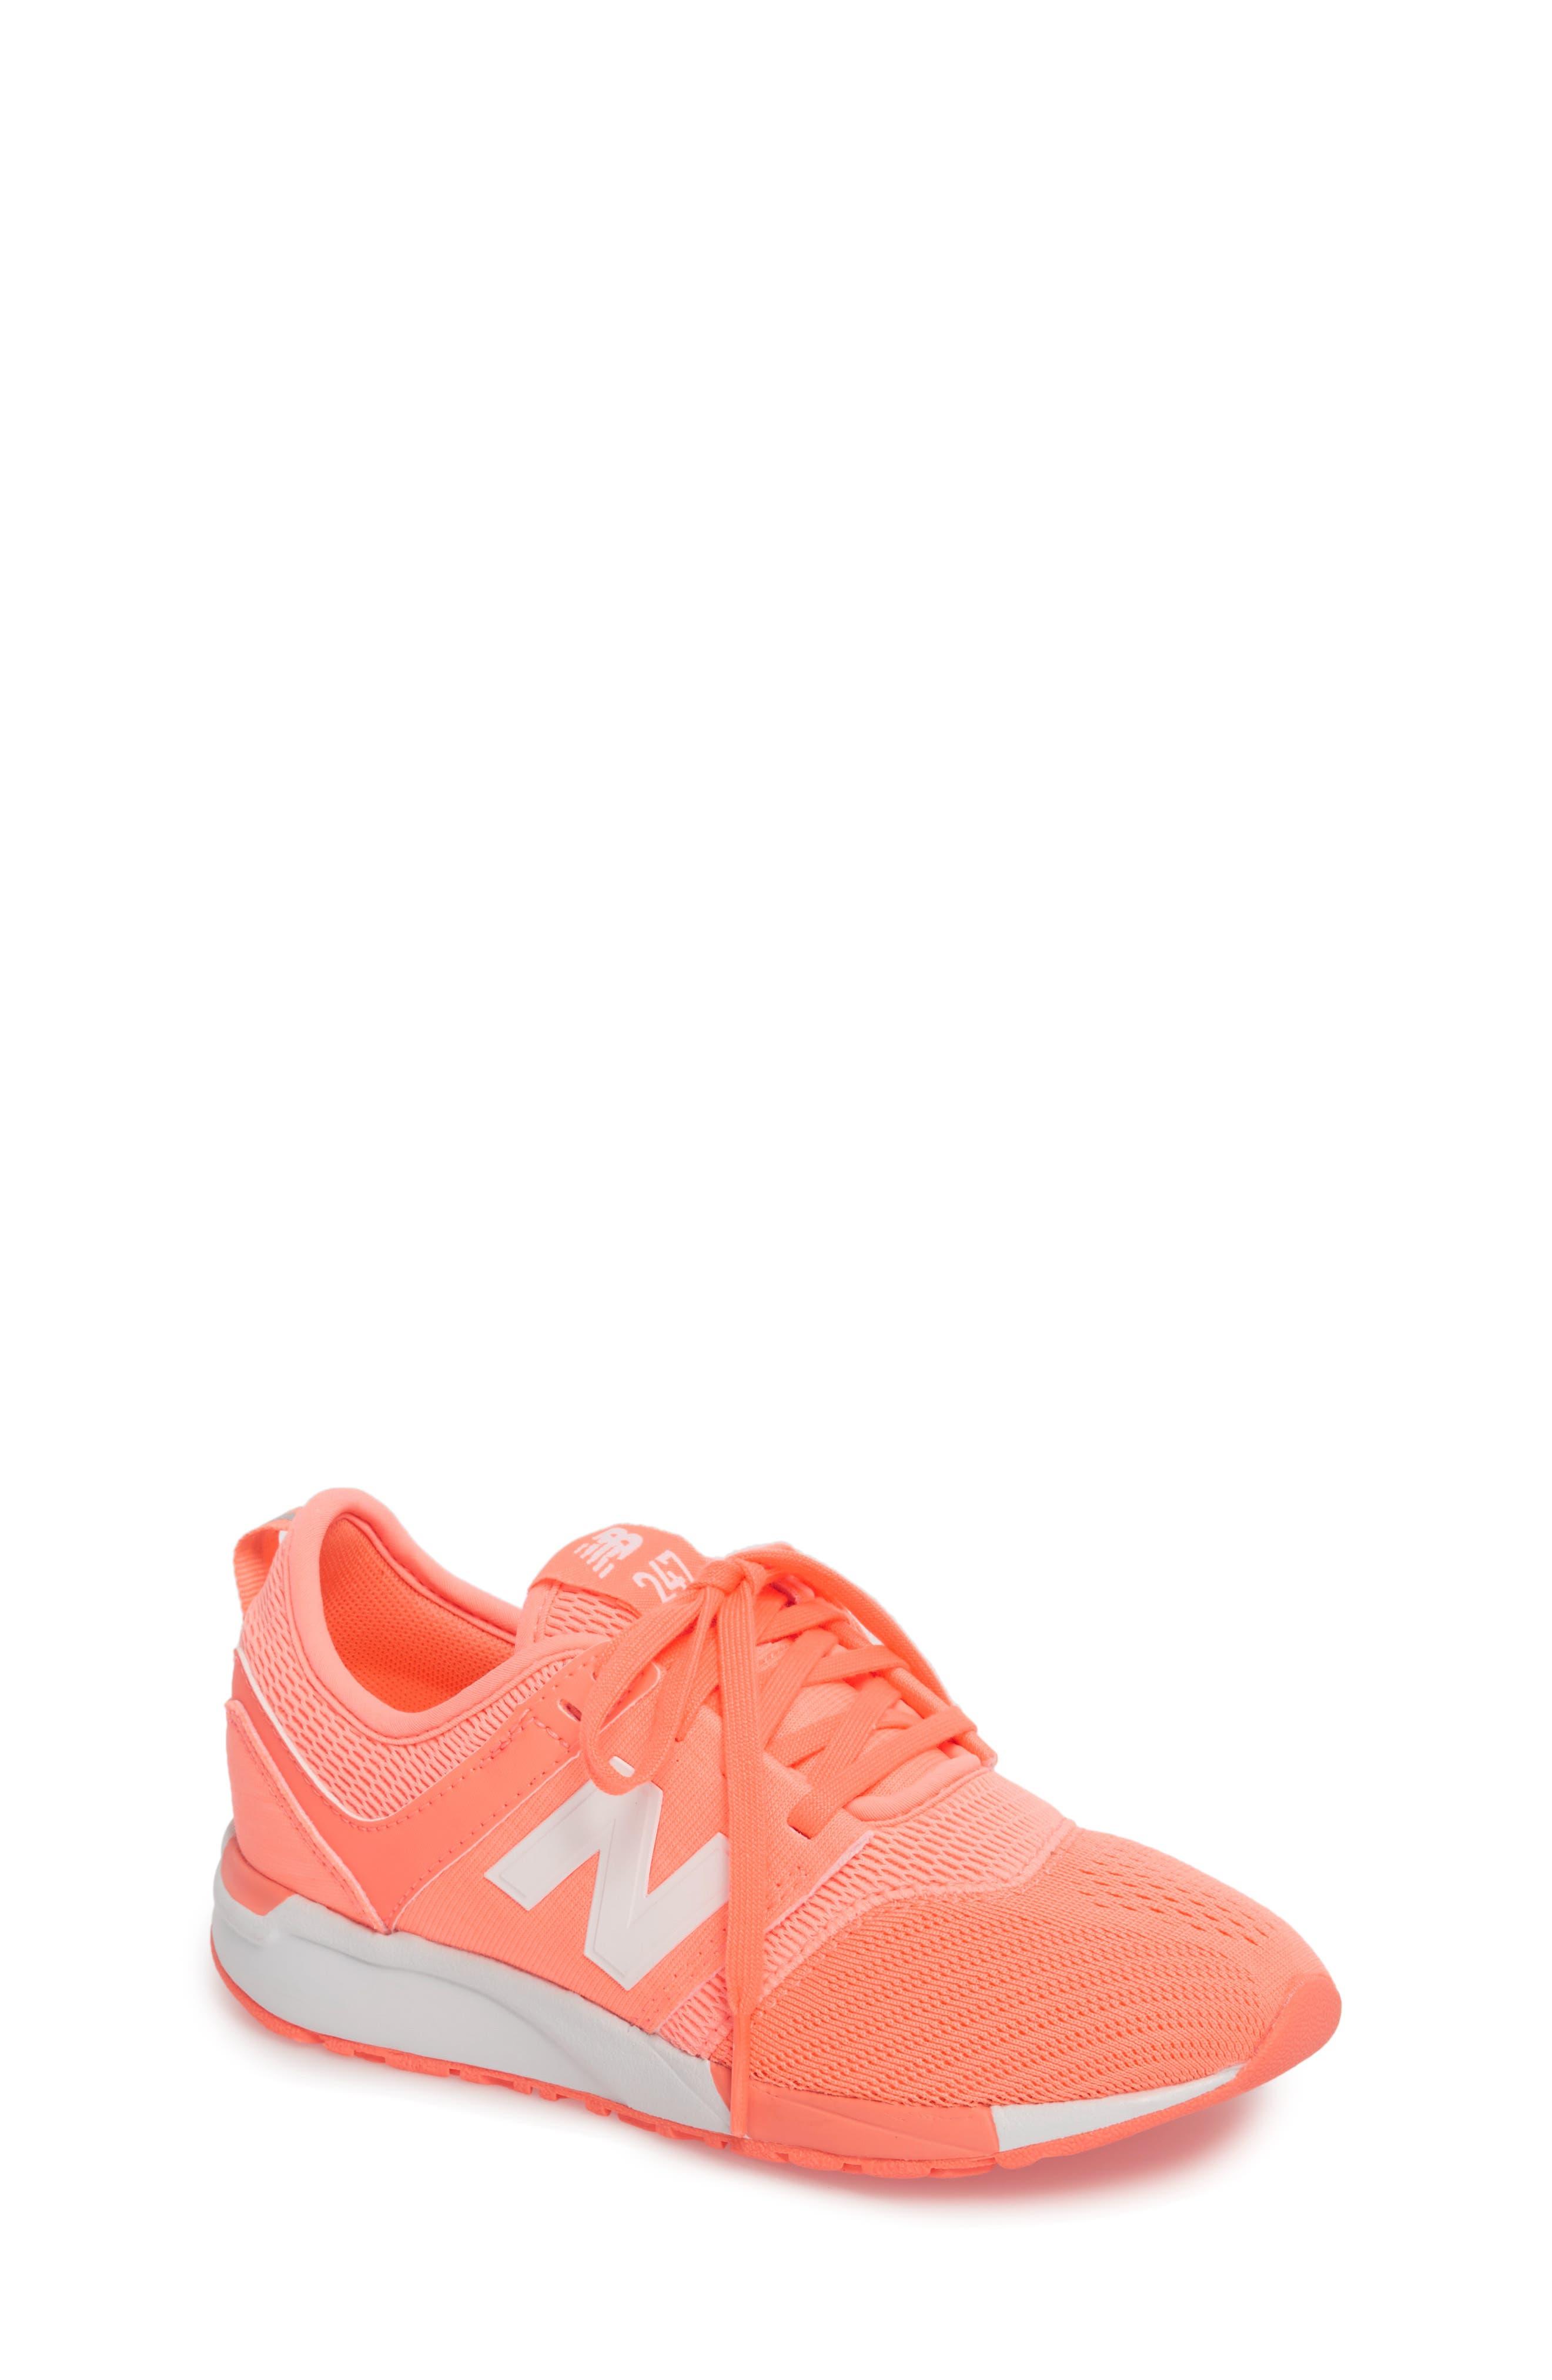 247 Sport Sneaker,                         Main,                         color, 653